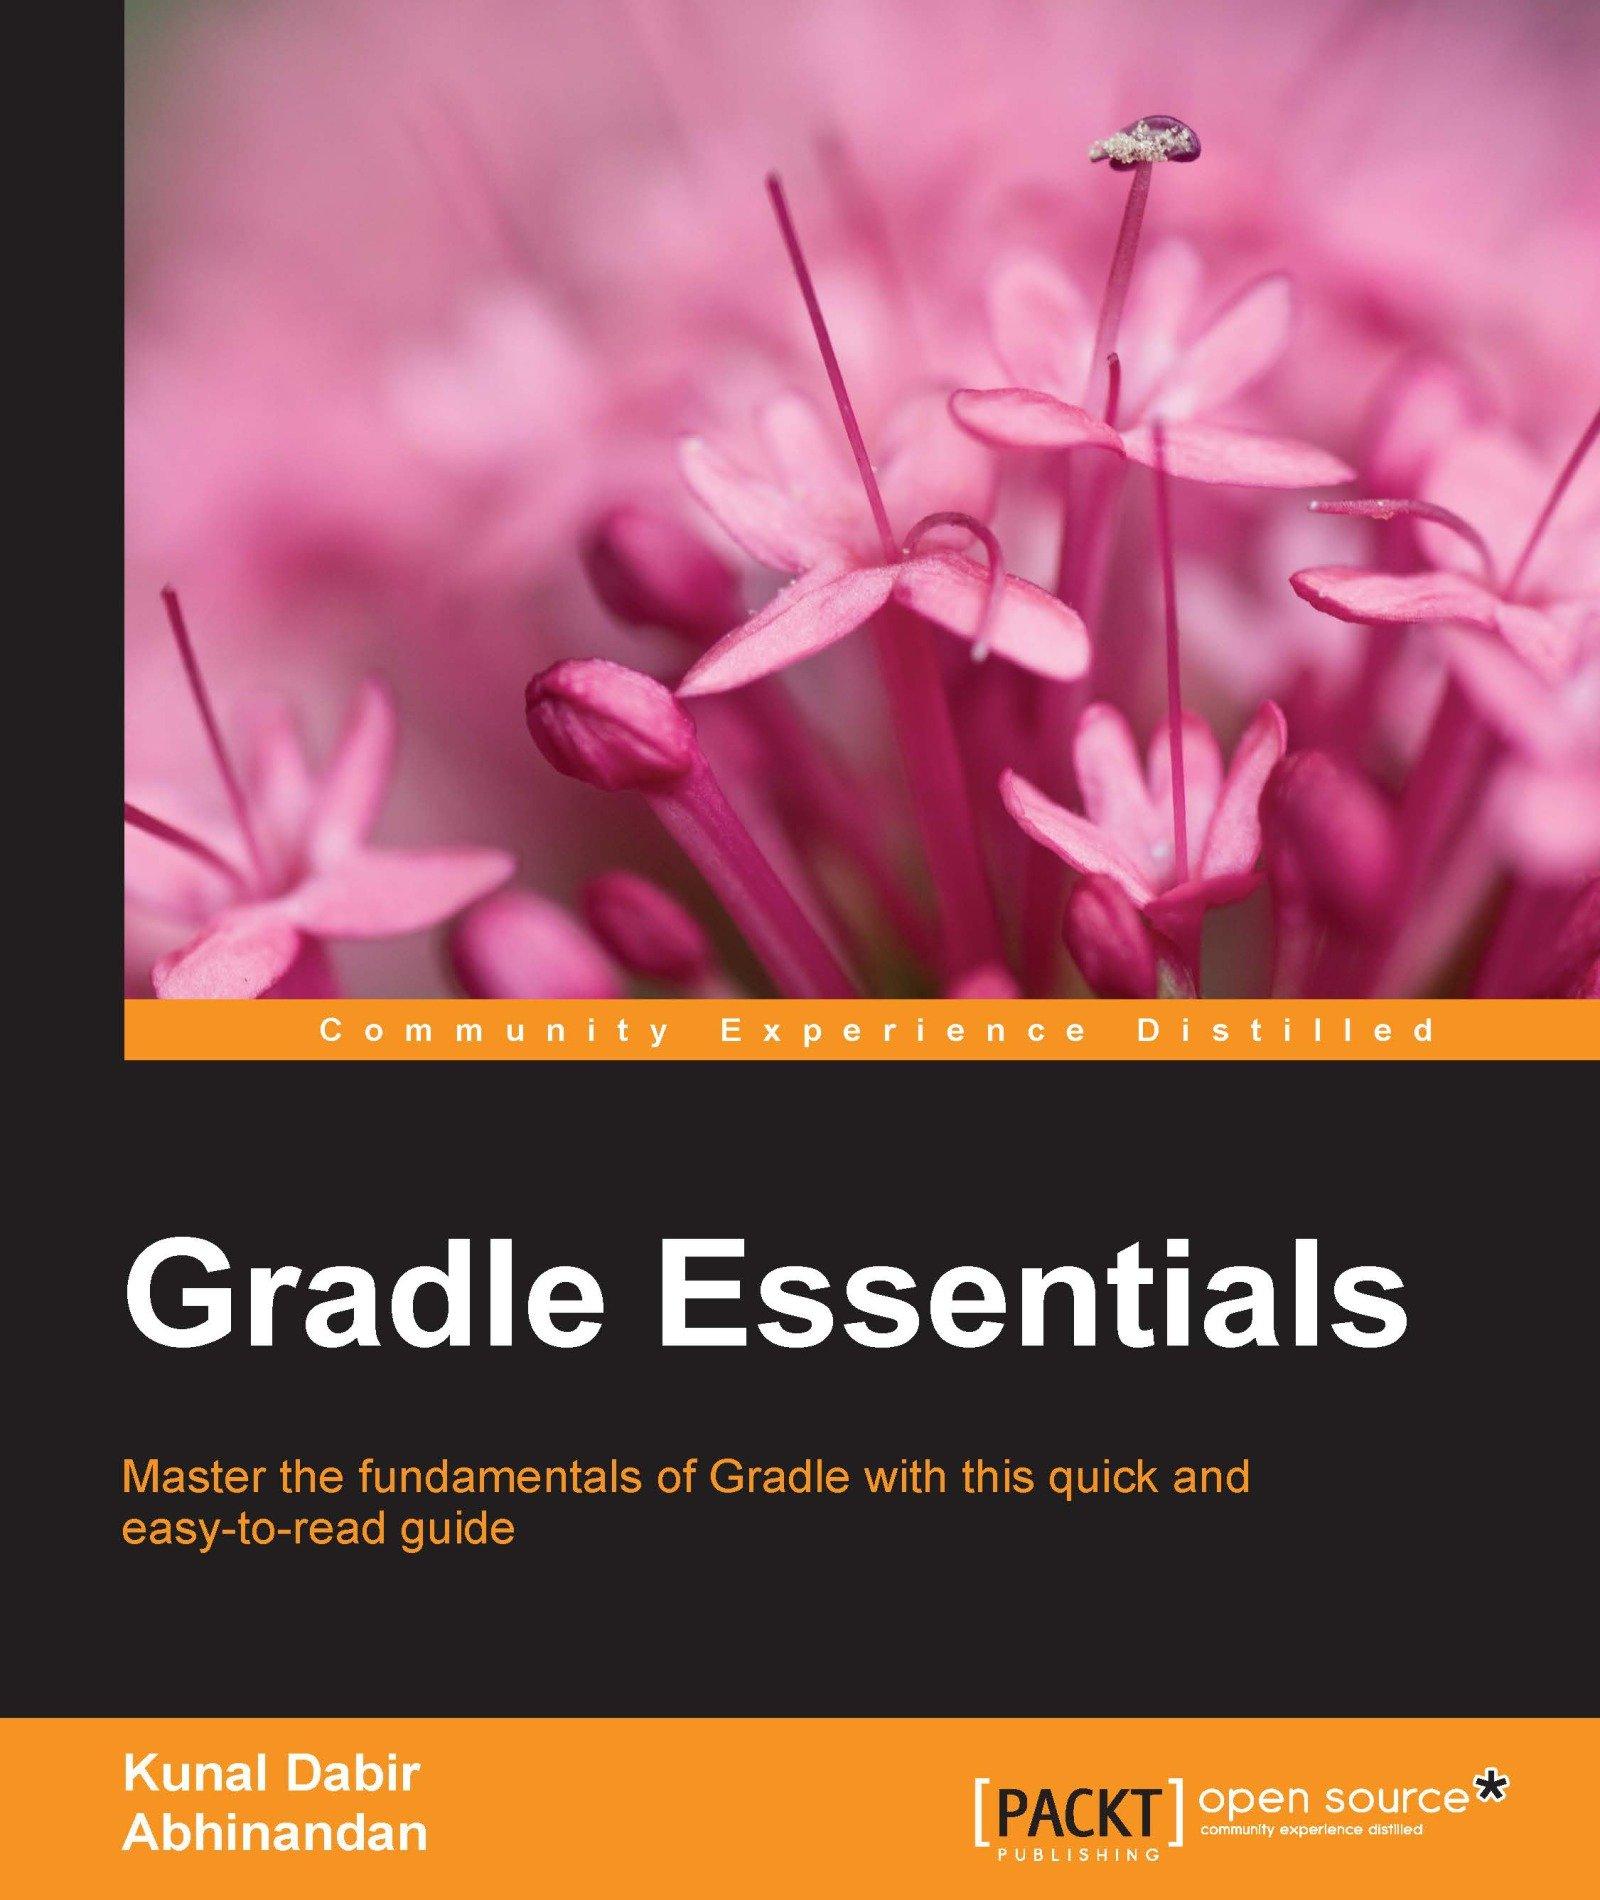 Gradle Essentials (Community Experience Distilled)